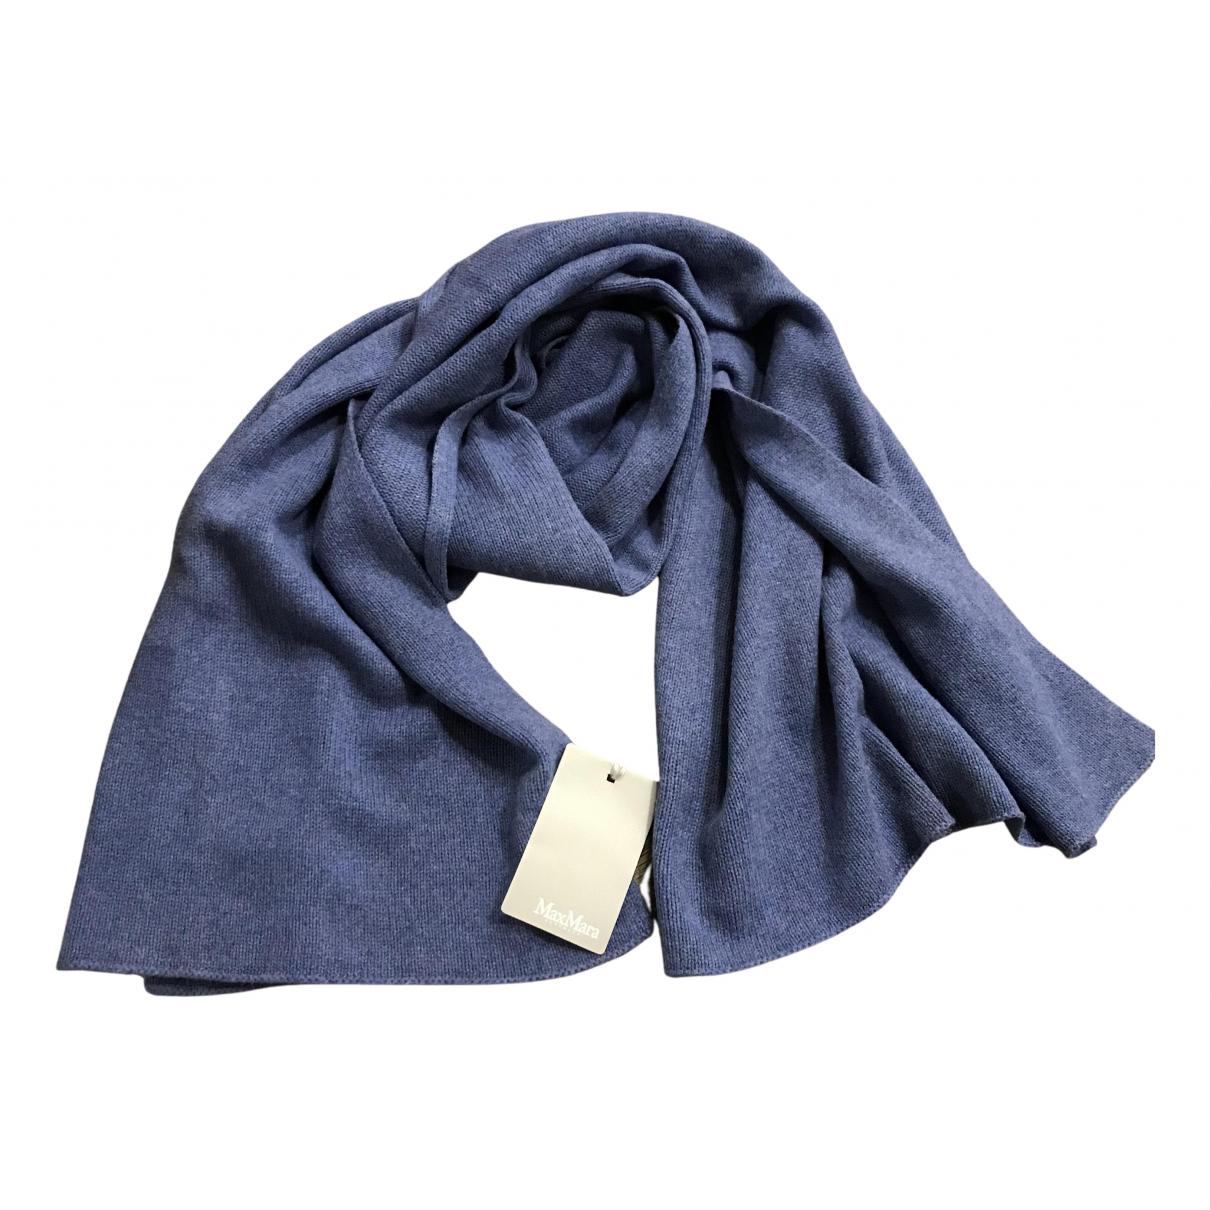 Max Mara N Blue Cashmere scarf for Women N